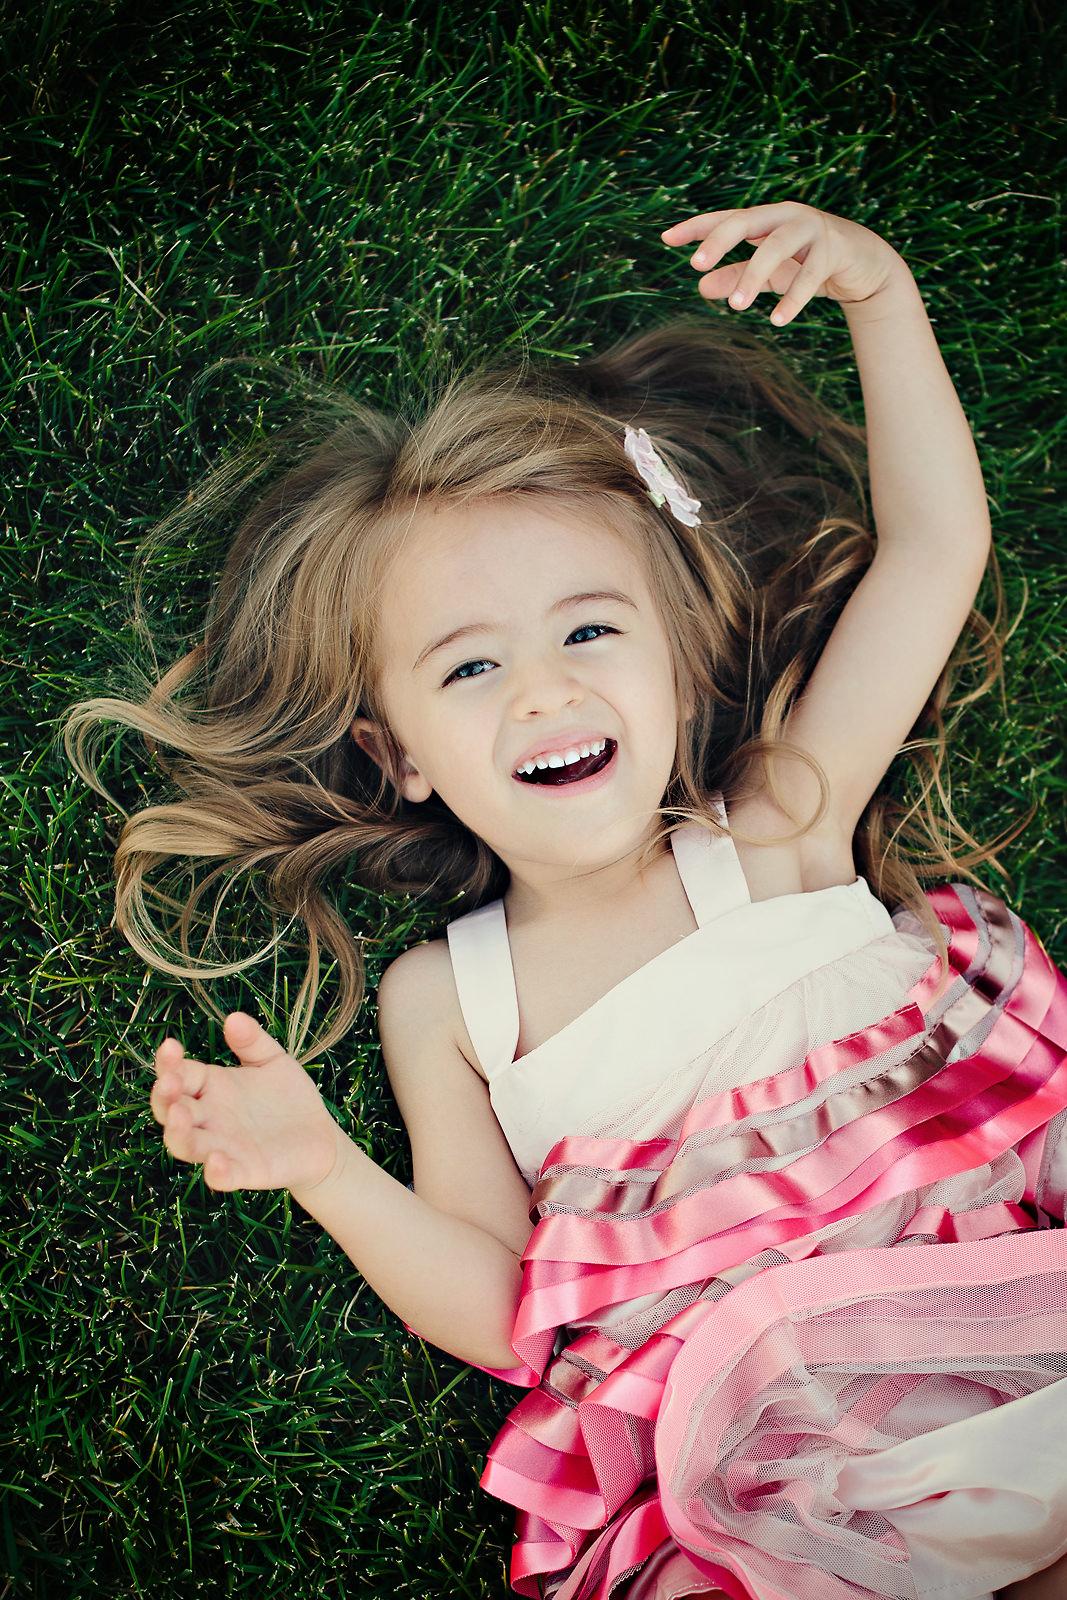 little-girl-pink-dress-laying-on-grass